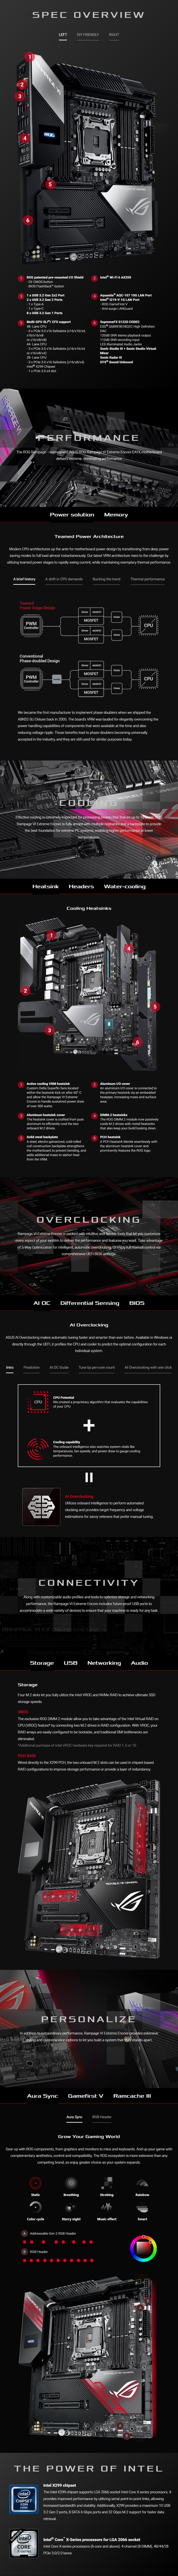 asus-rog-rampage-vi-extreme-encore-lga-2066-eatx-motherboard-ac28302-8.jpg